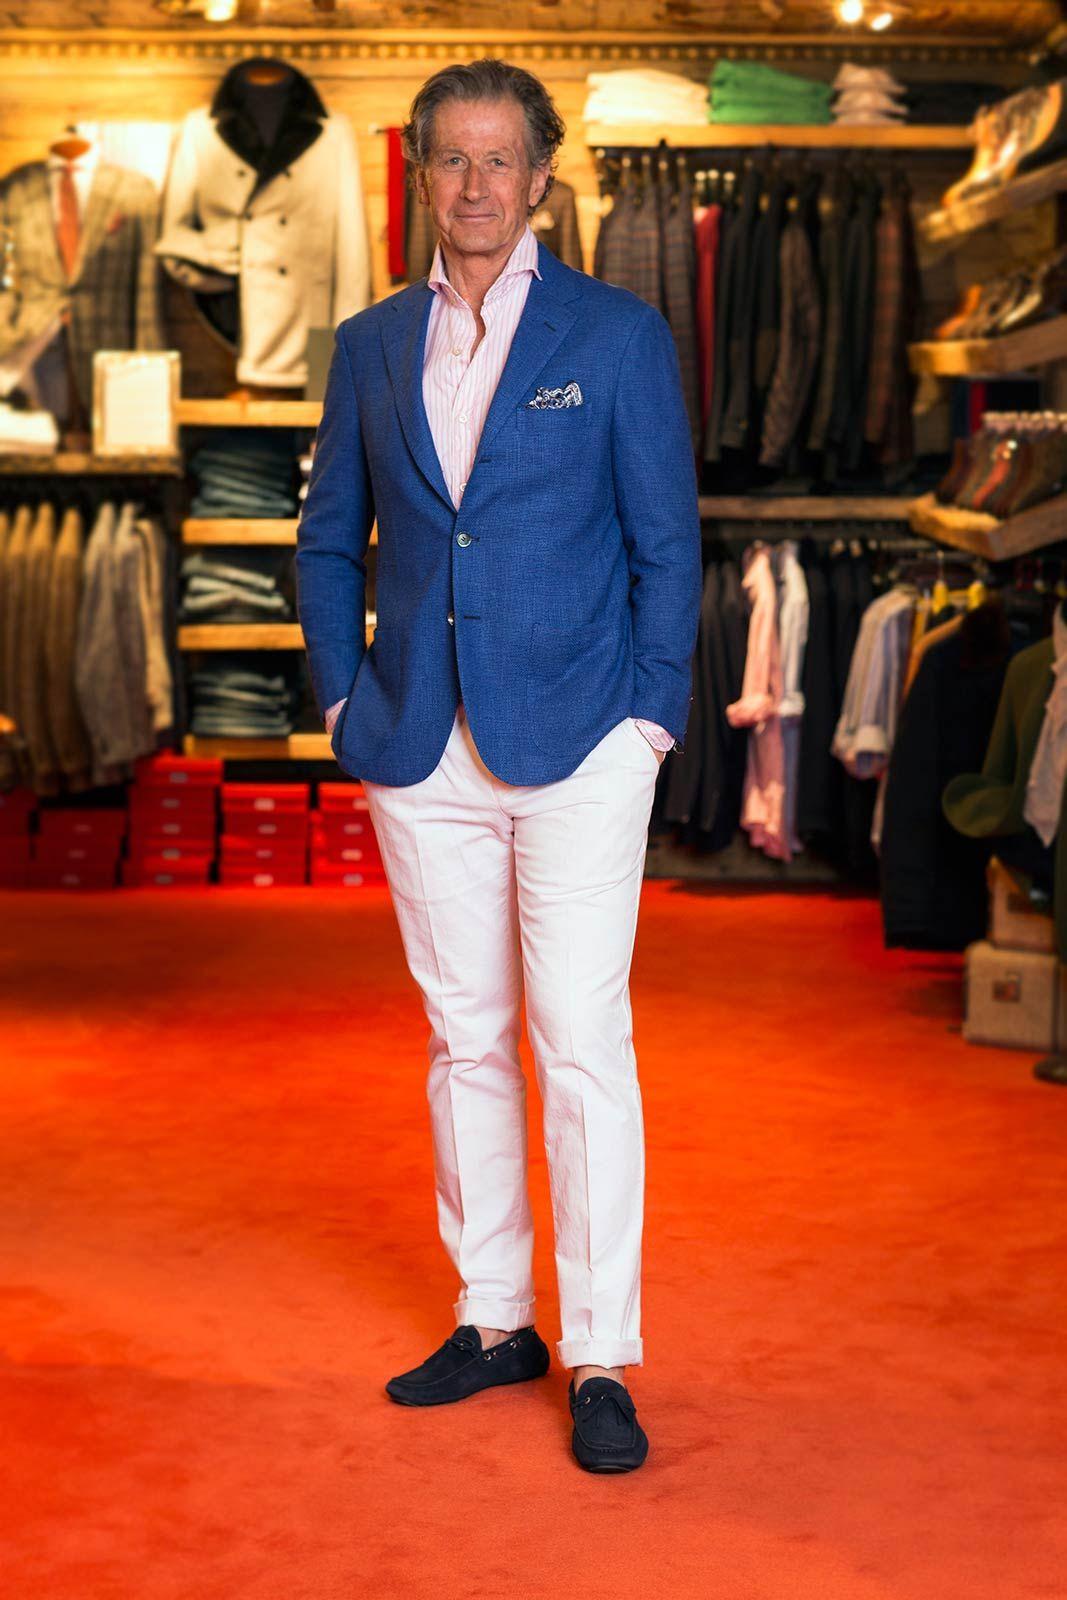 Axel wearing SartorioGinoble Royal Sport Coat, FinamoreSergio Double White/Pink Stripe Sport Shirt, Pantaloni TorinoSlim Fit Feleti Trousers In White & Kiton Atvani Drivers. Visit us at www.axelsltd.com for more information or call us at(970) 497-4888.